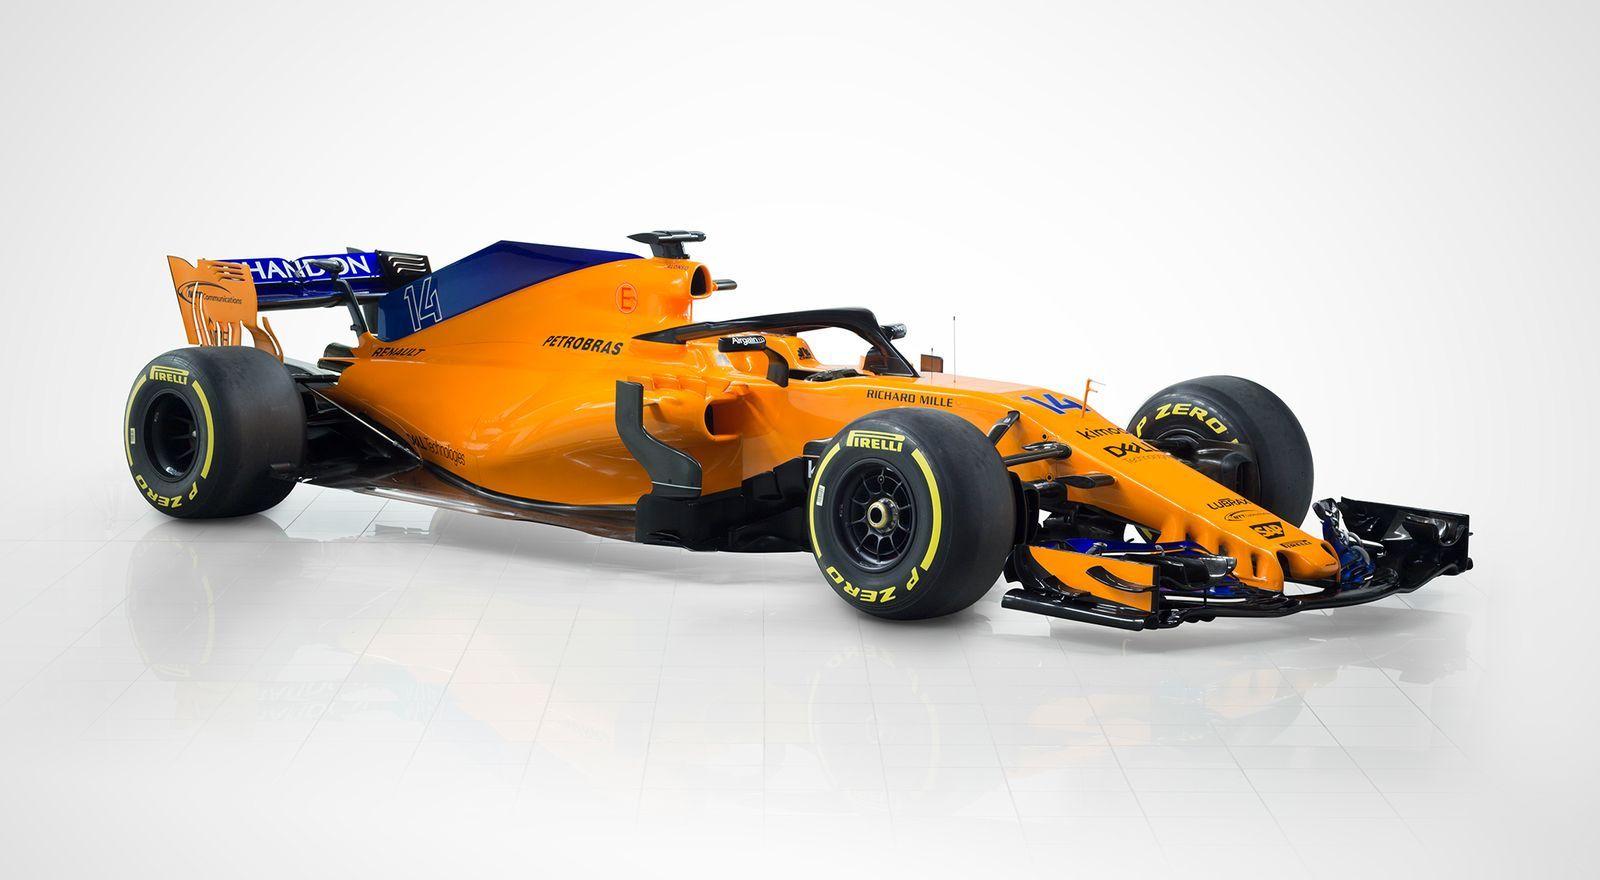 McLaren F1 Team MCL 33 - 2018 - front side-face